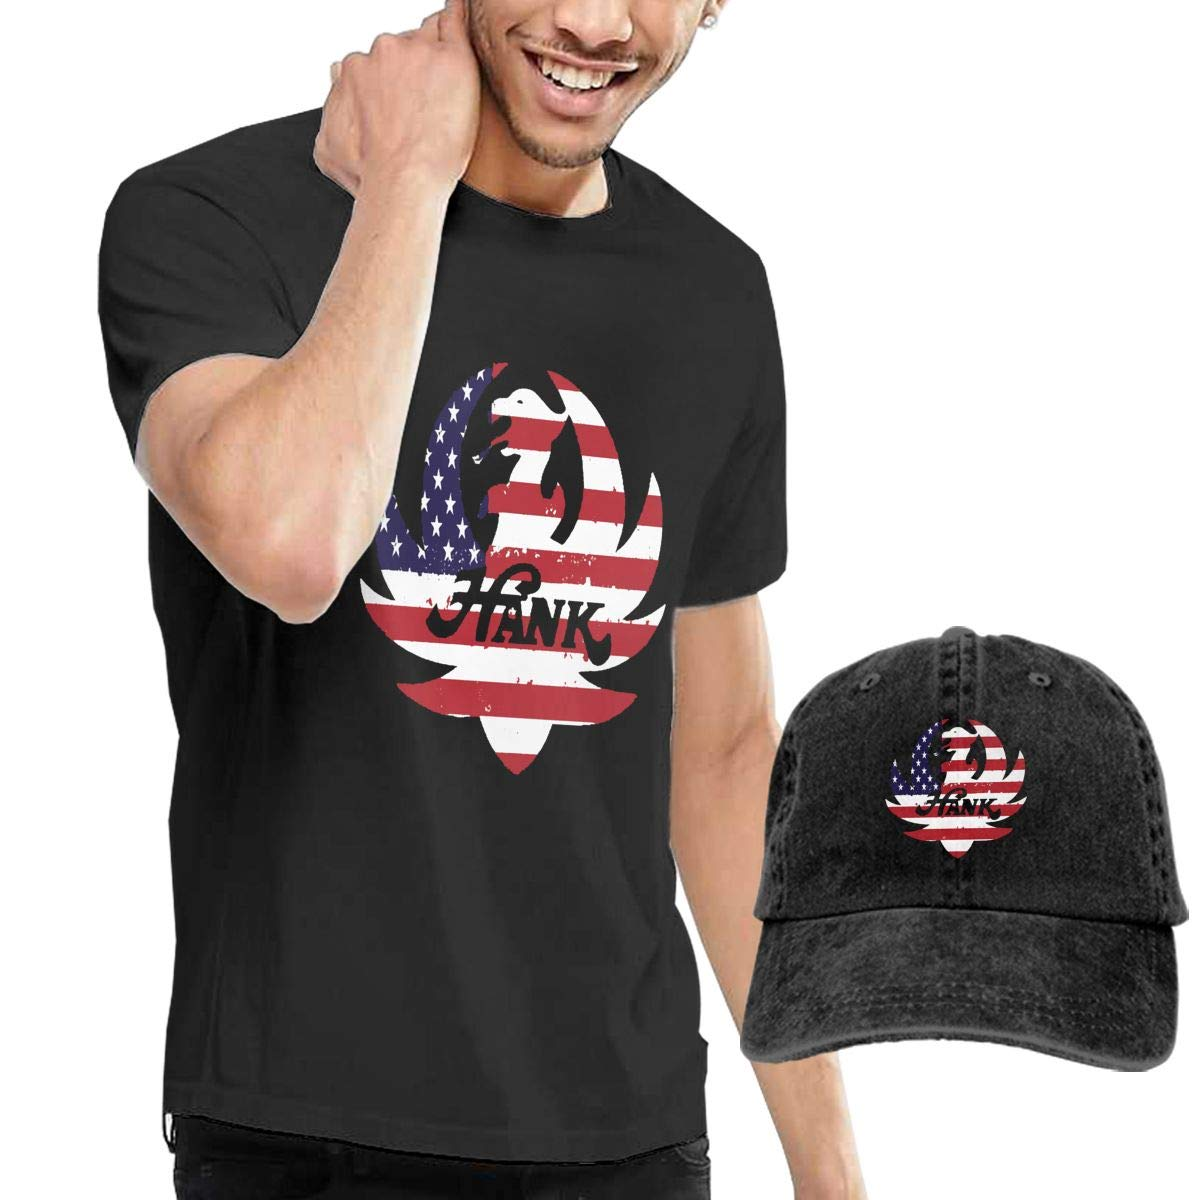 2Pcs Mens Casual Hank Williams Jr Tee Shirts Short Sleeve O-Neck Cotton T Shirt Tops for Boys Men Plus Size Tshirt Hat